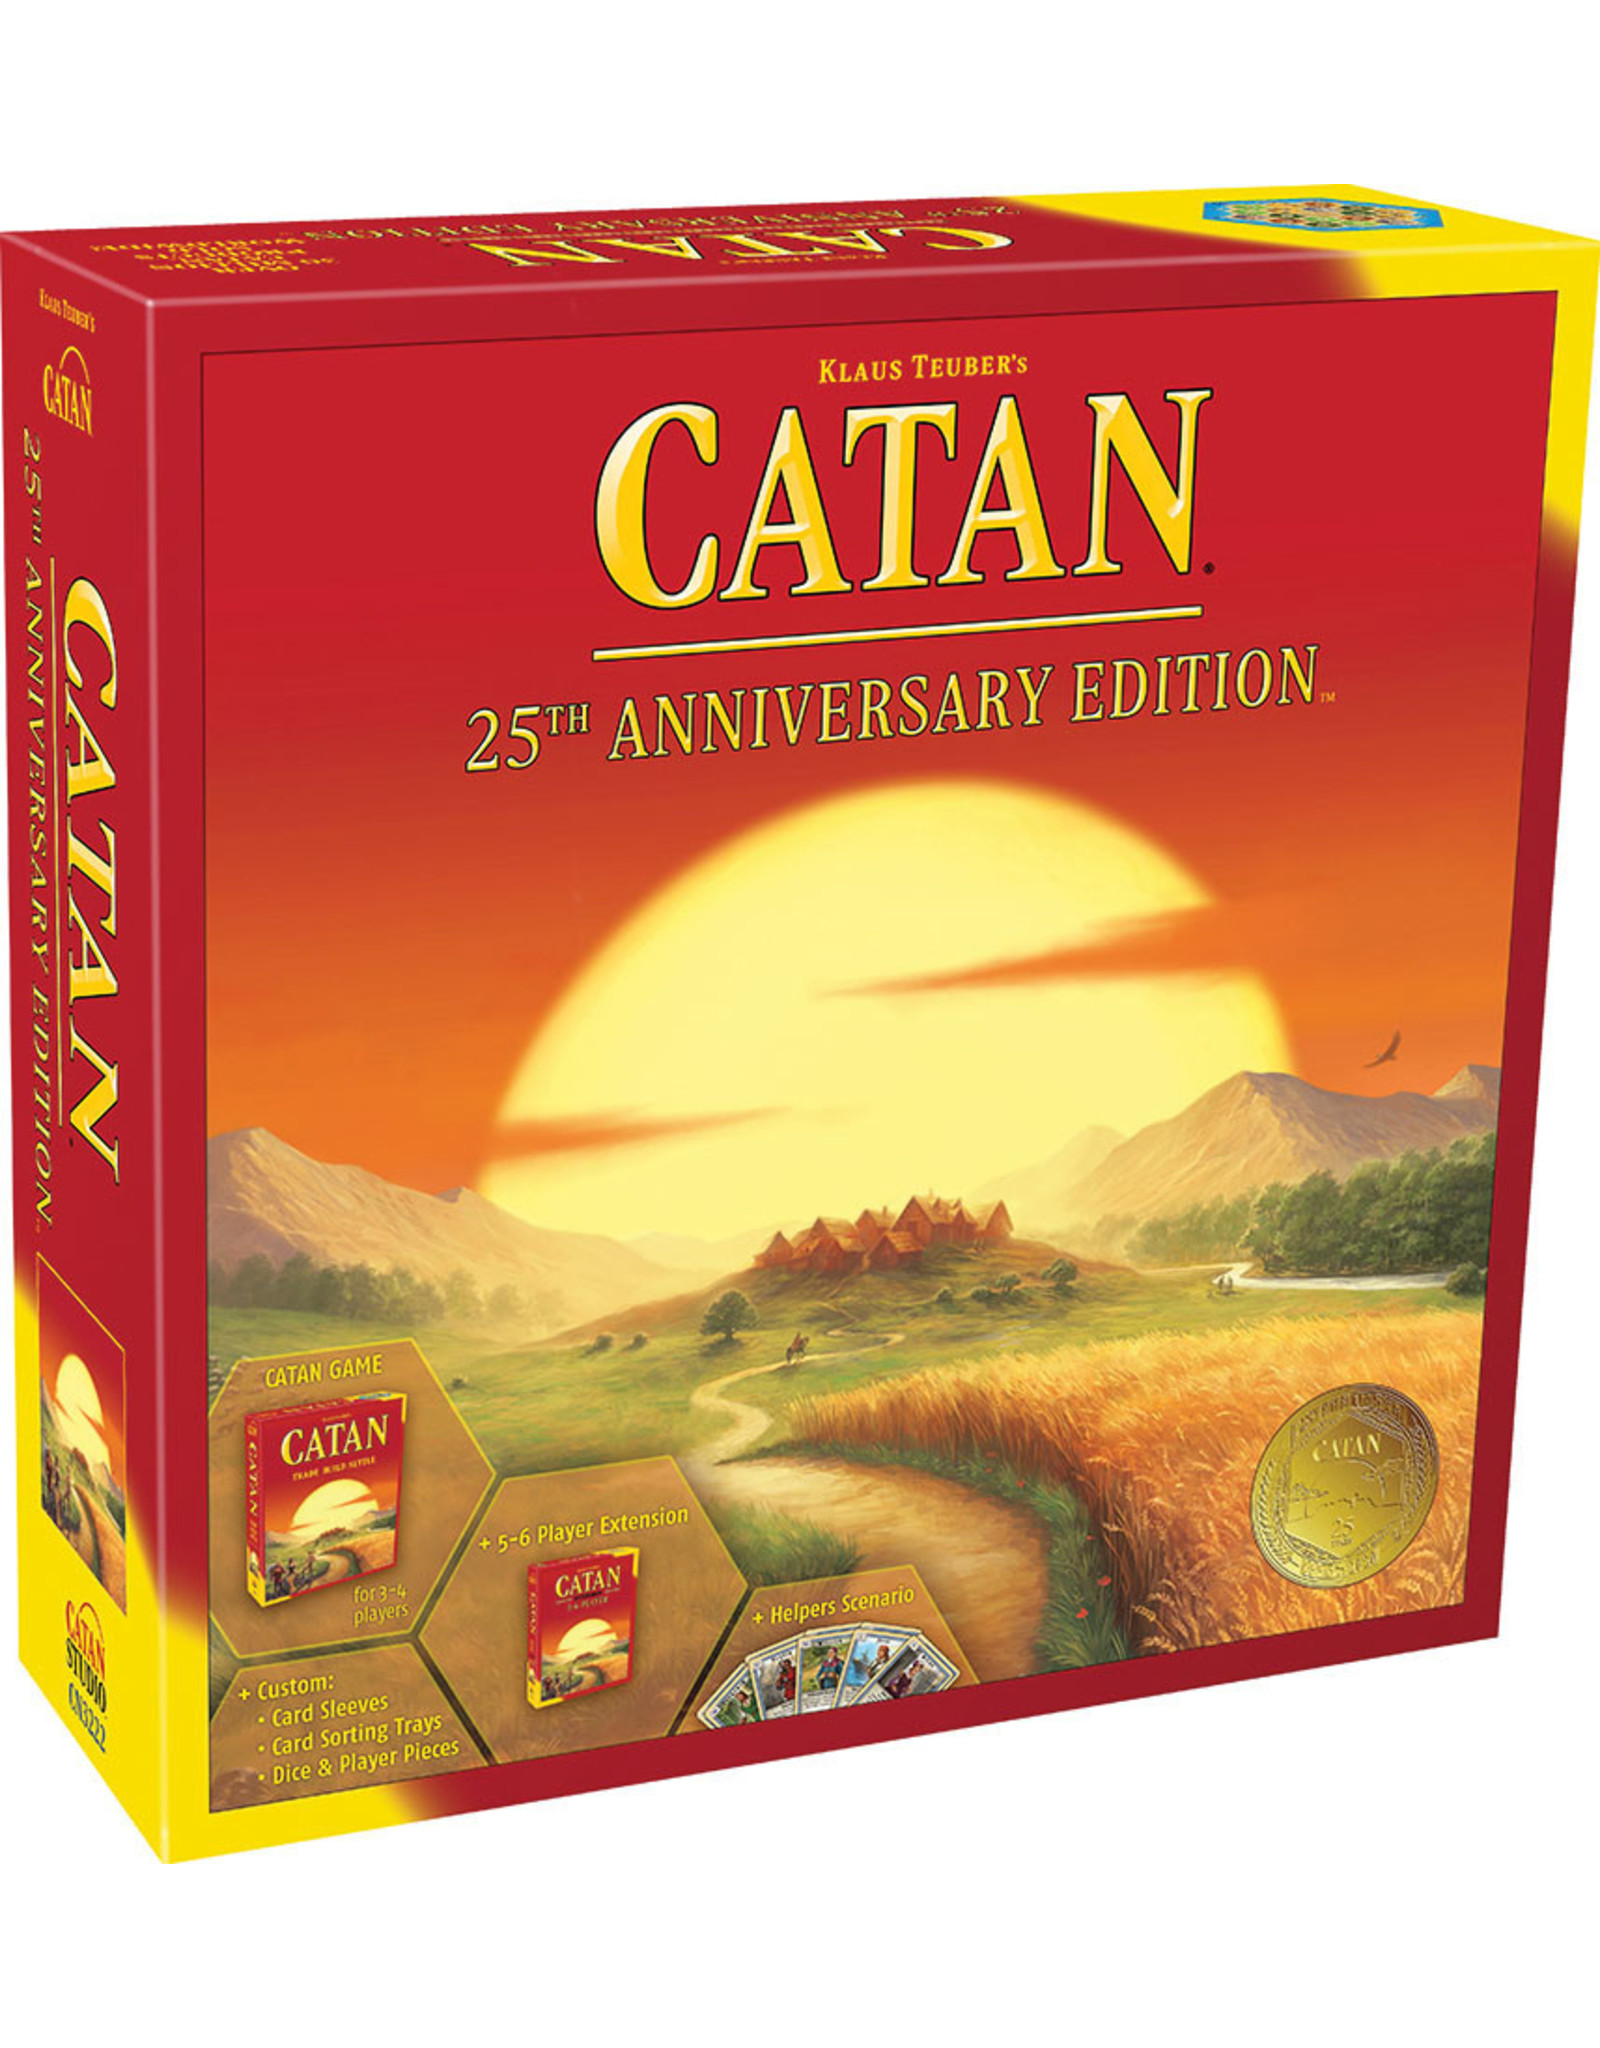 Catan Studios PREORDER: Catan: 25th Anniversary Edition